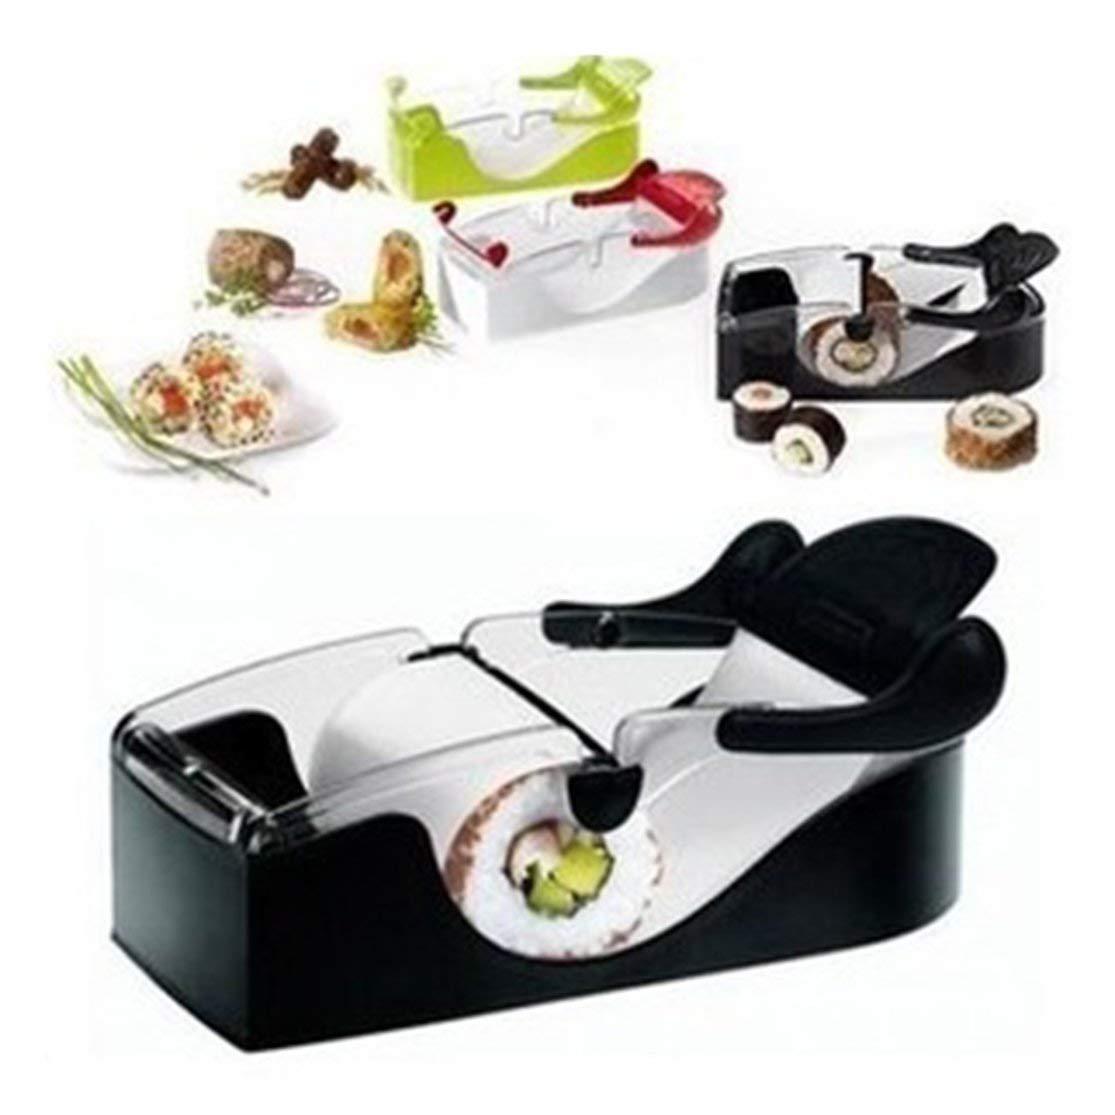 Candyboom Creativo Magic Sushi Roll Maker Portable Rice Sushi Roller Mold Perfetto Facile Sushi Che Fa Macchina Cucina Gadget